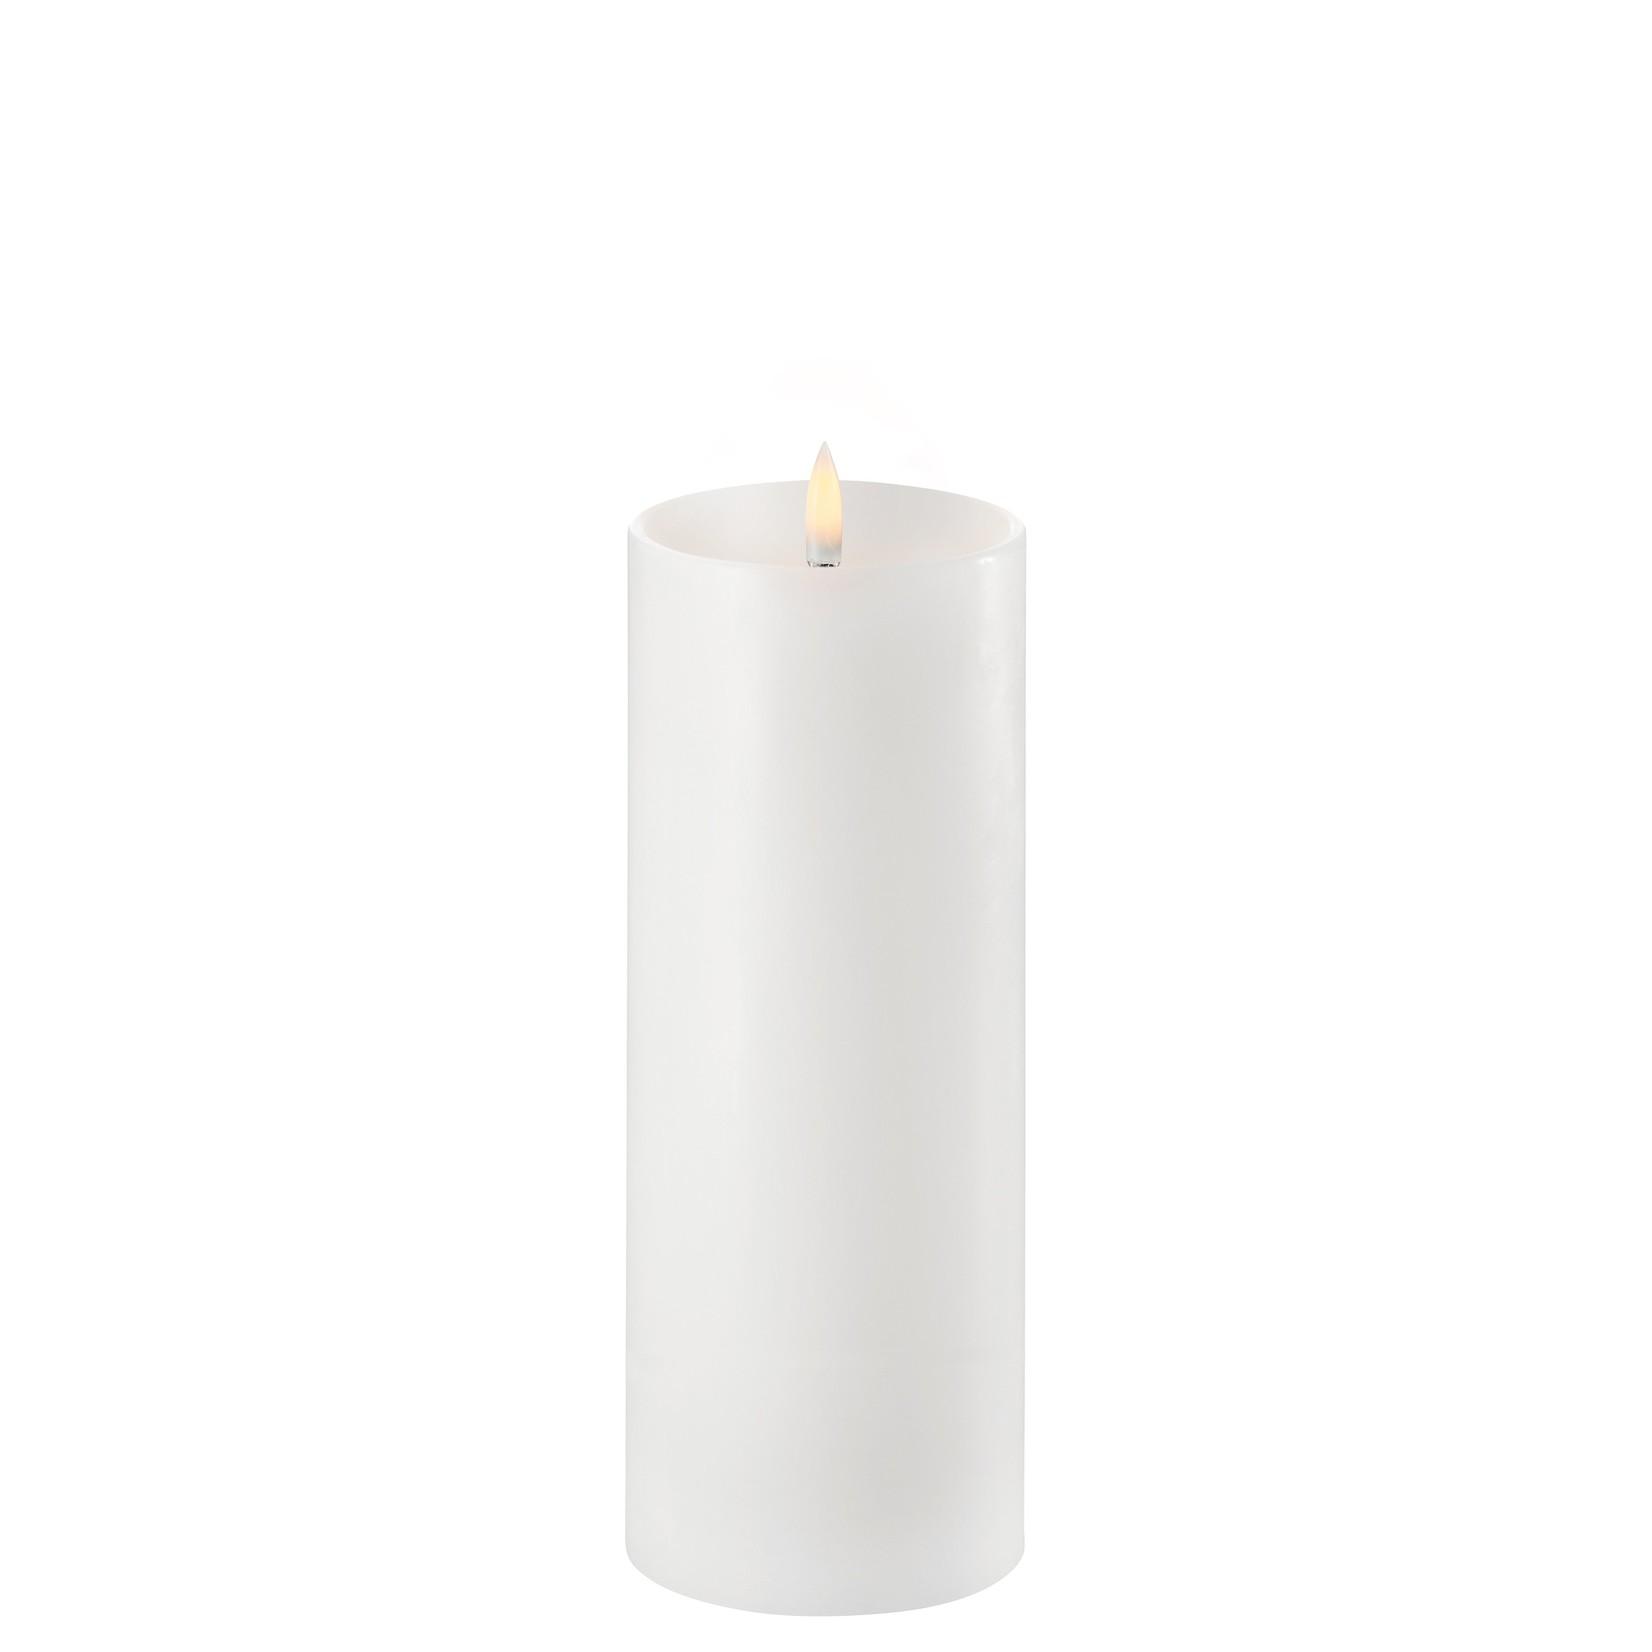 UYUNI LIGHTING LED PILLAR CANDLE - NORDIC WHITE - Ø7,8 x 20 CM - w. Shoulder